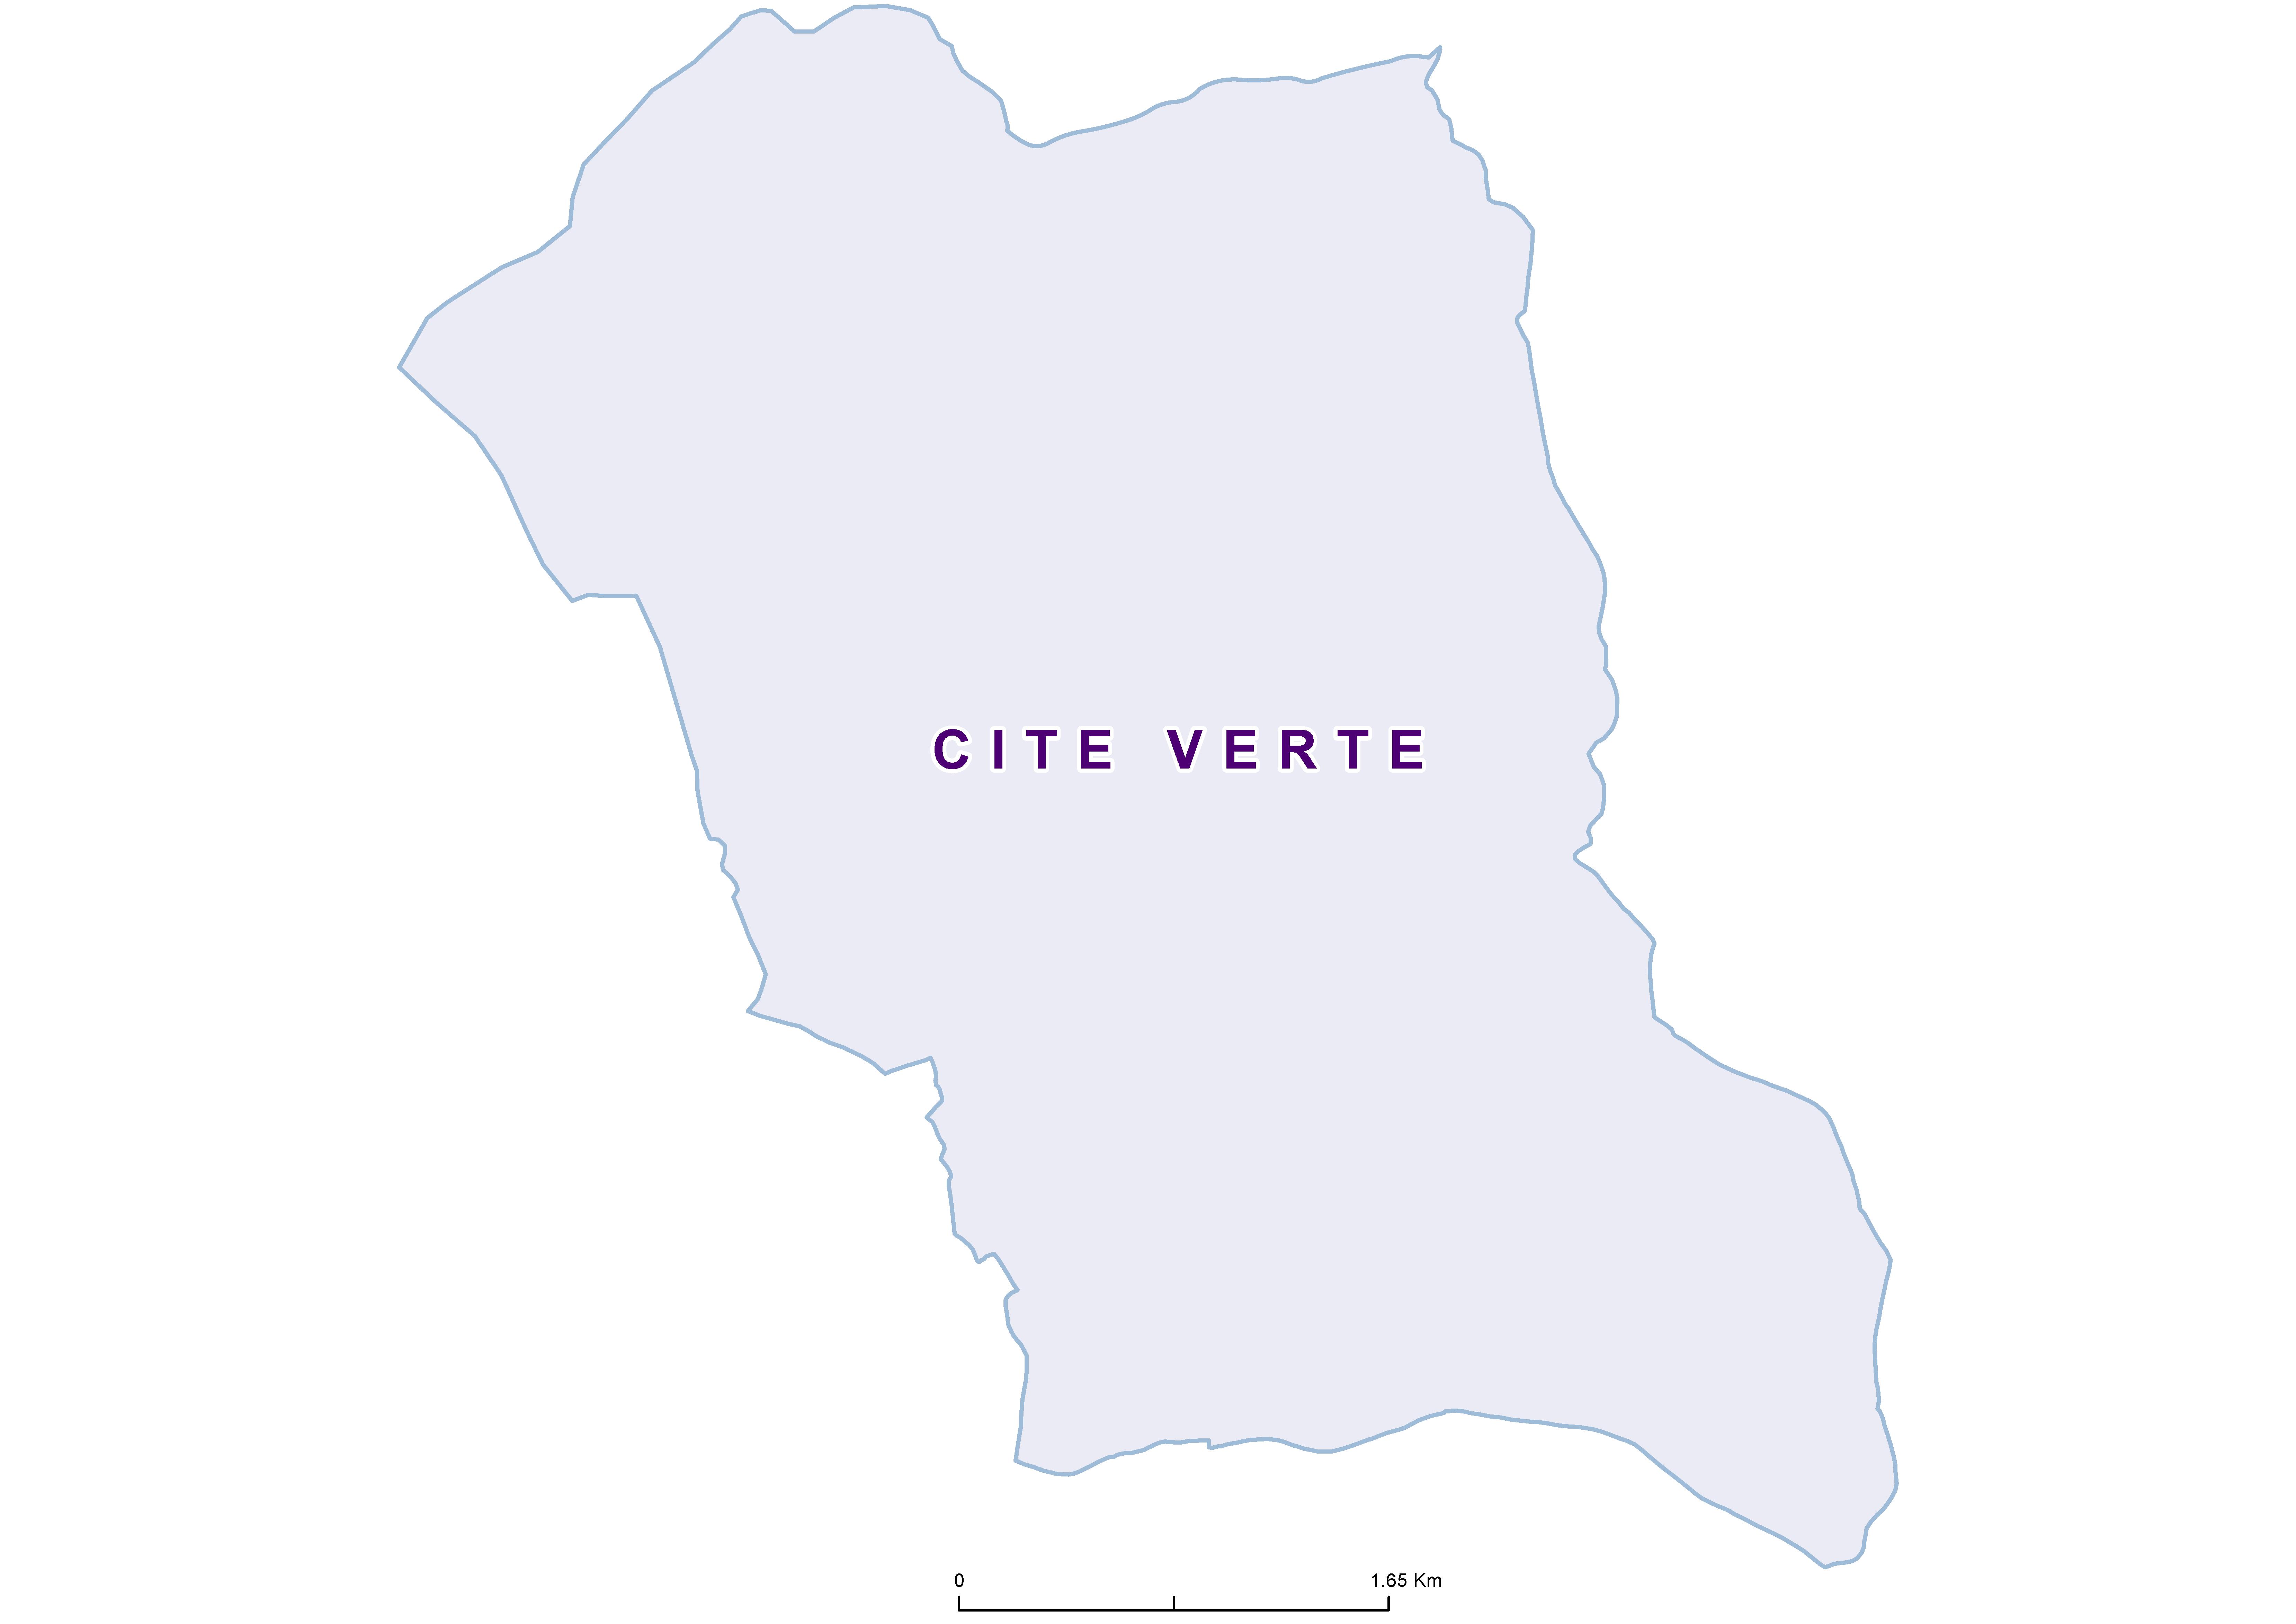 Cite verte Mean STH 19850001